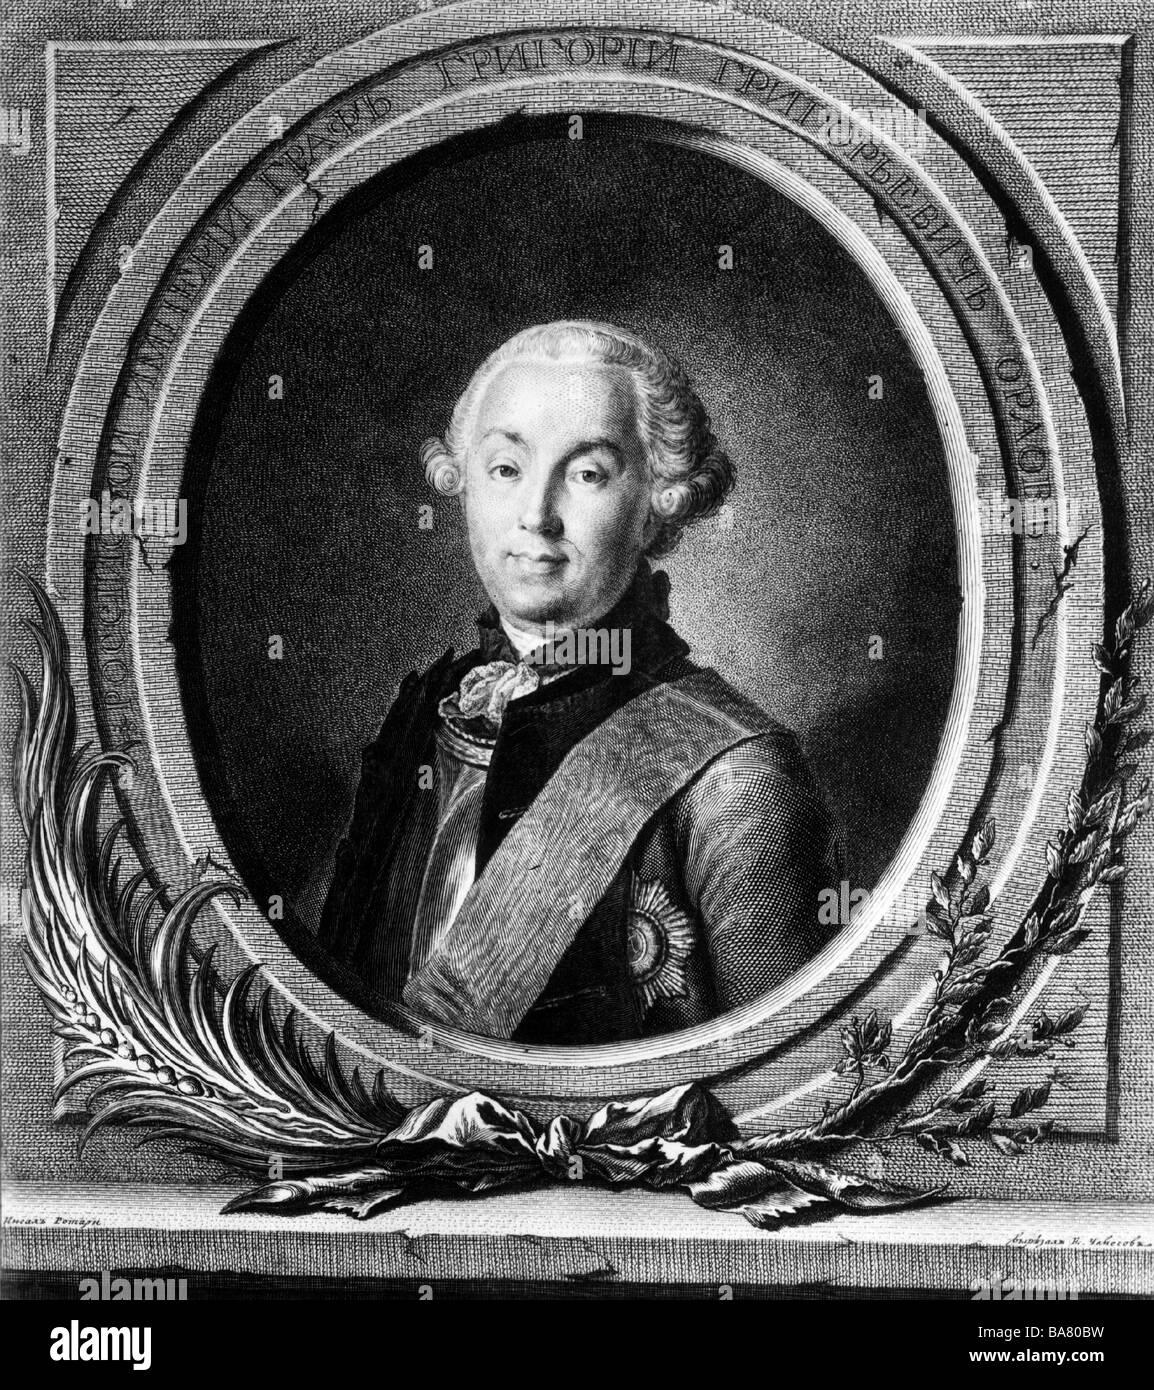 Orlov, Grigory Grigoryevich, 17.10.1734 - 24.4.1783, Russian general, portrait, copper engraving, 18th century, - Stock Image